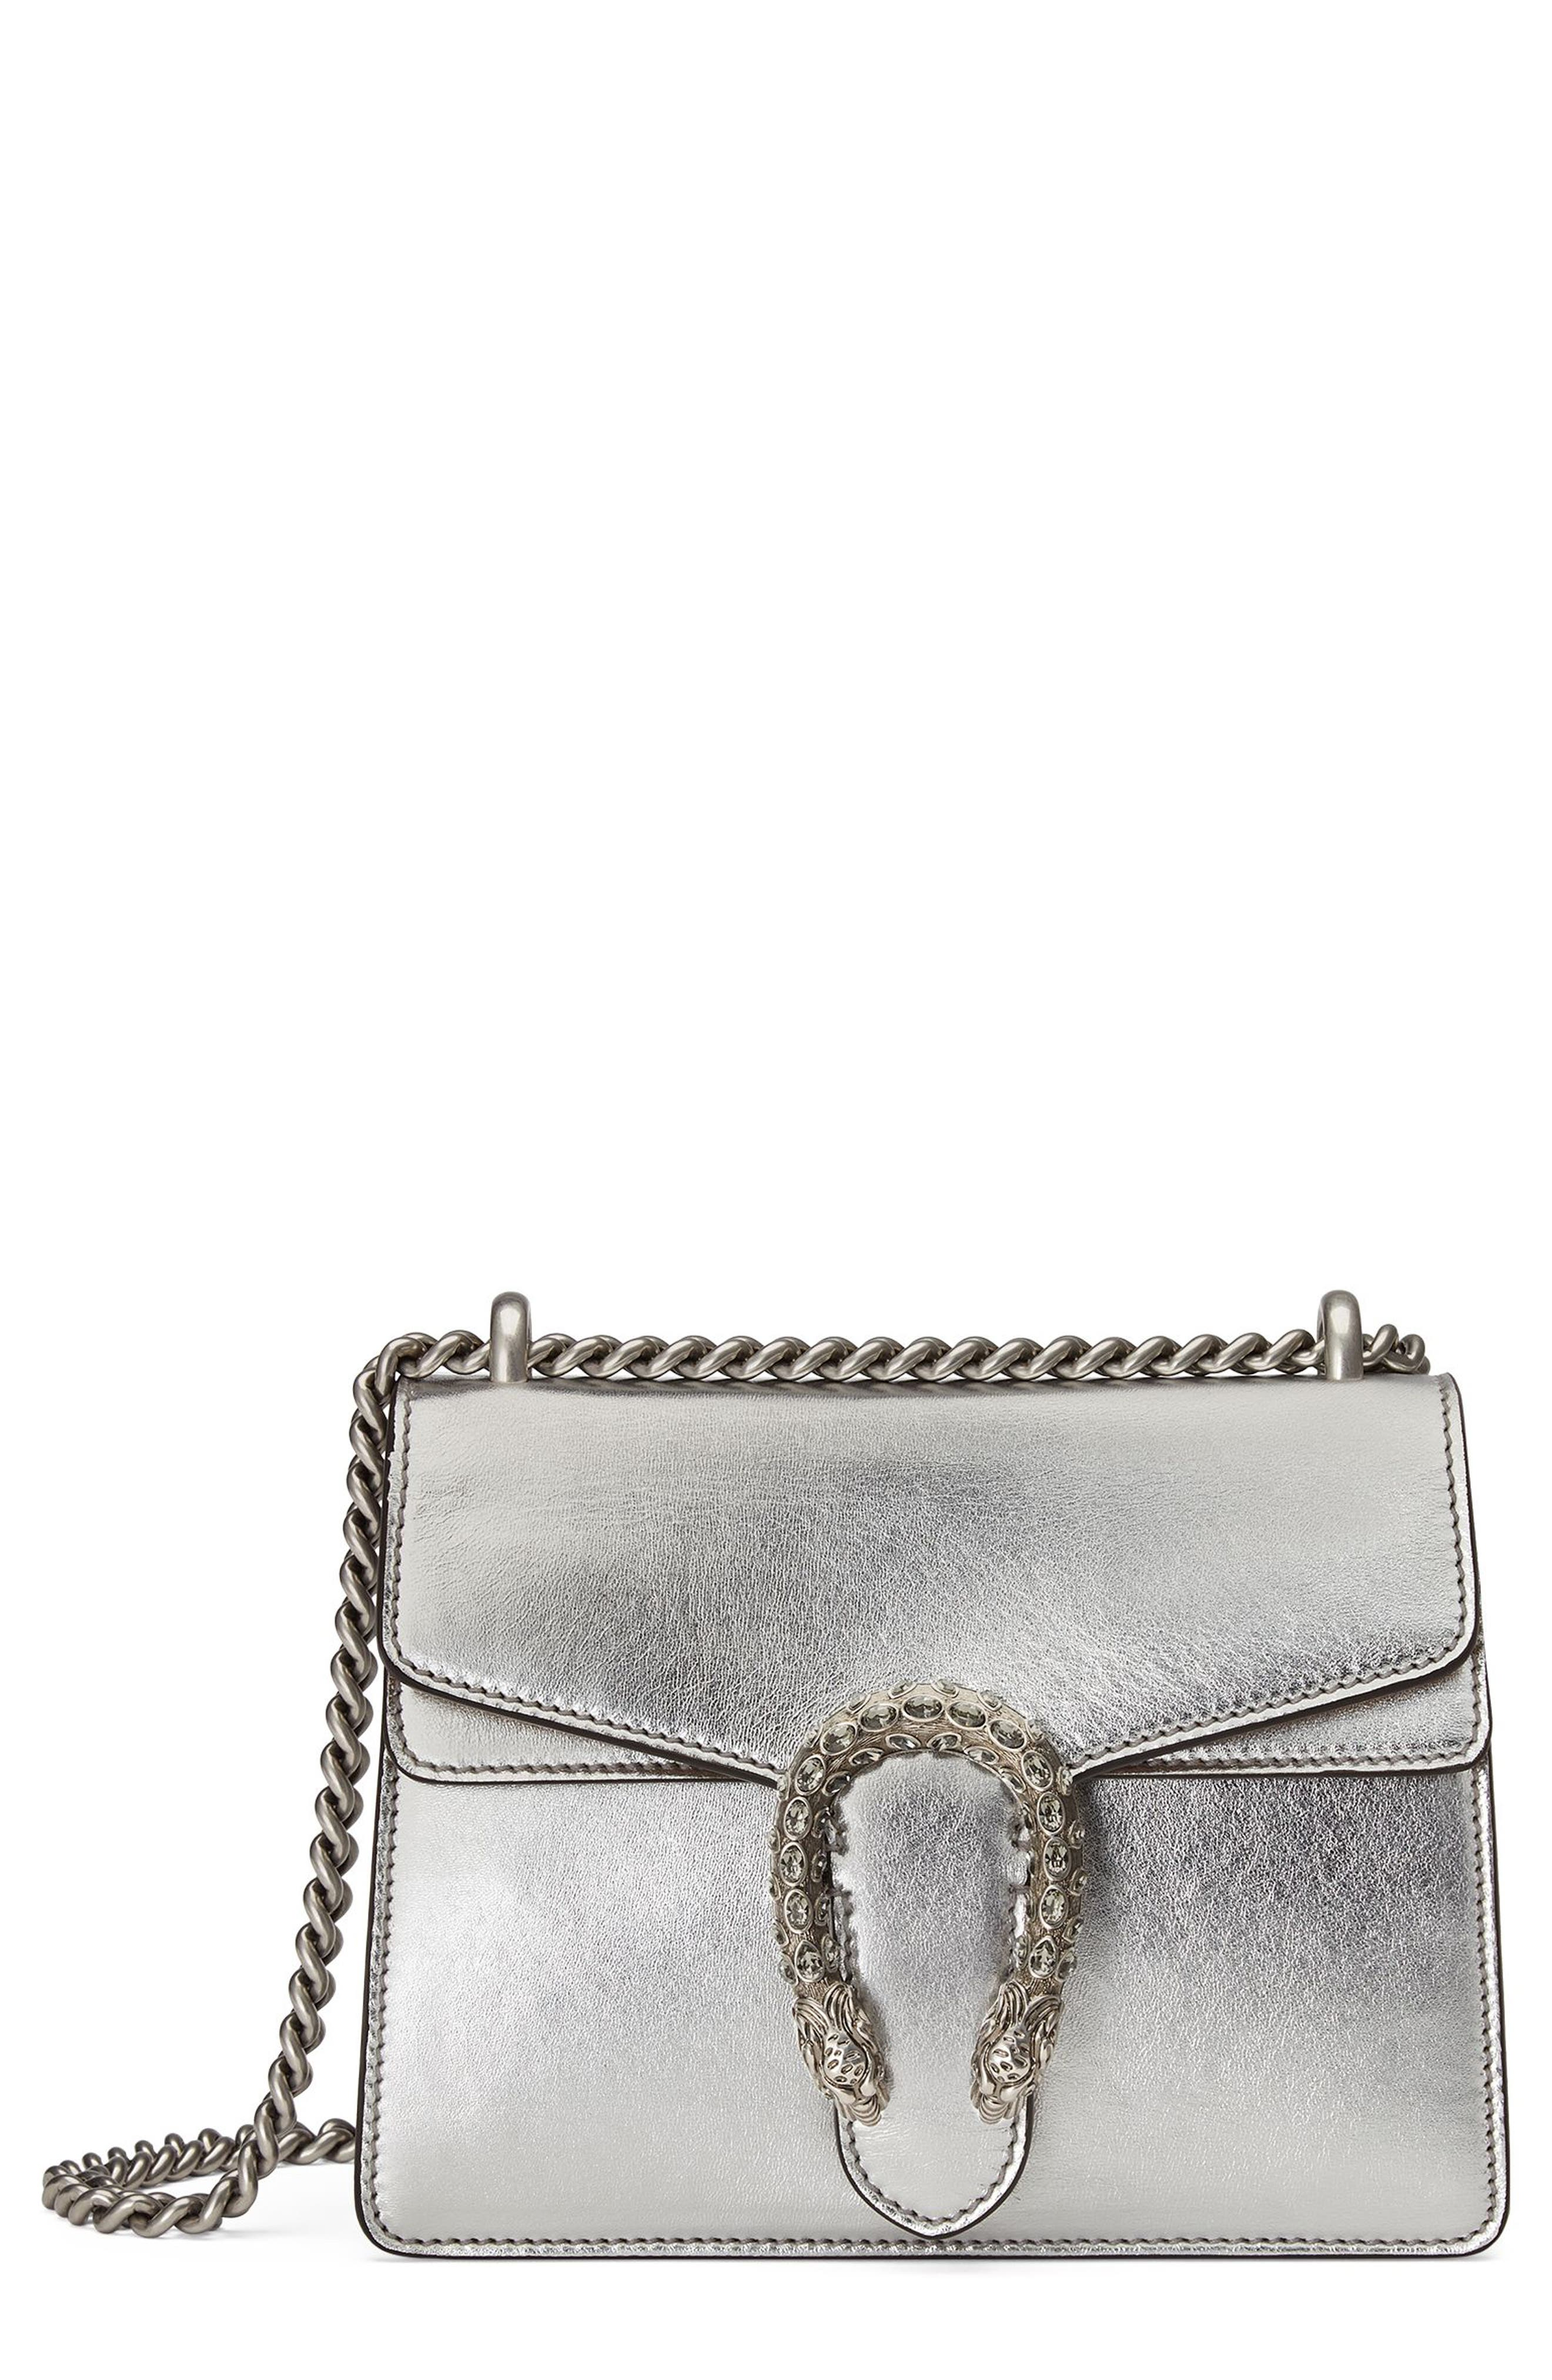 Mini Dionysus Metallic Leather Shoulder Bag,                         Main,                         color, Argento/Blk Diamond